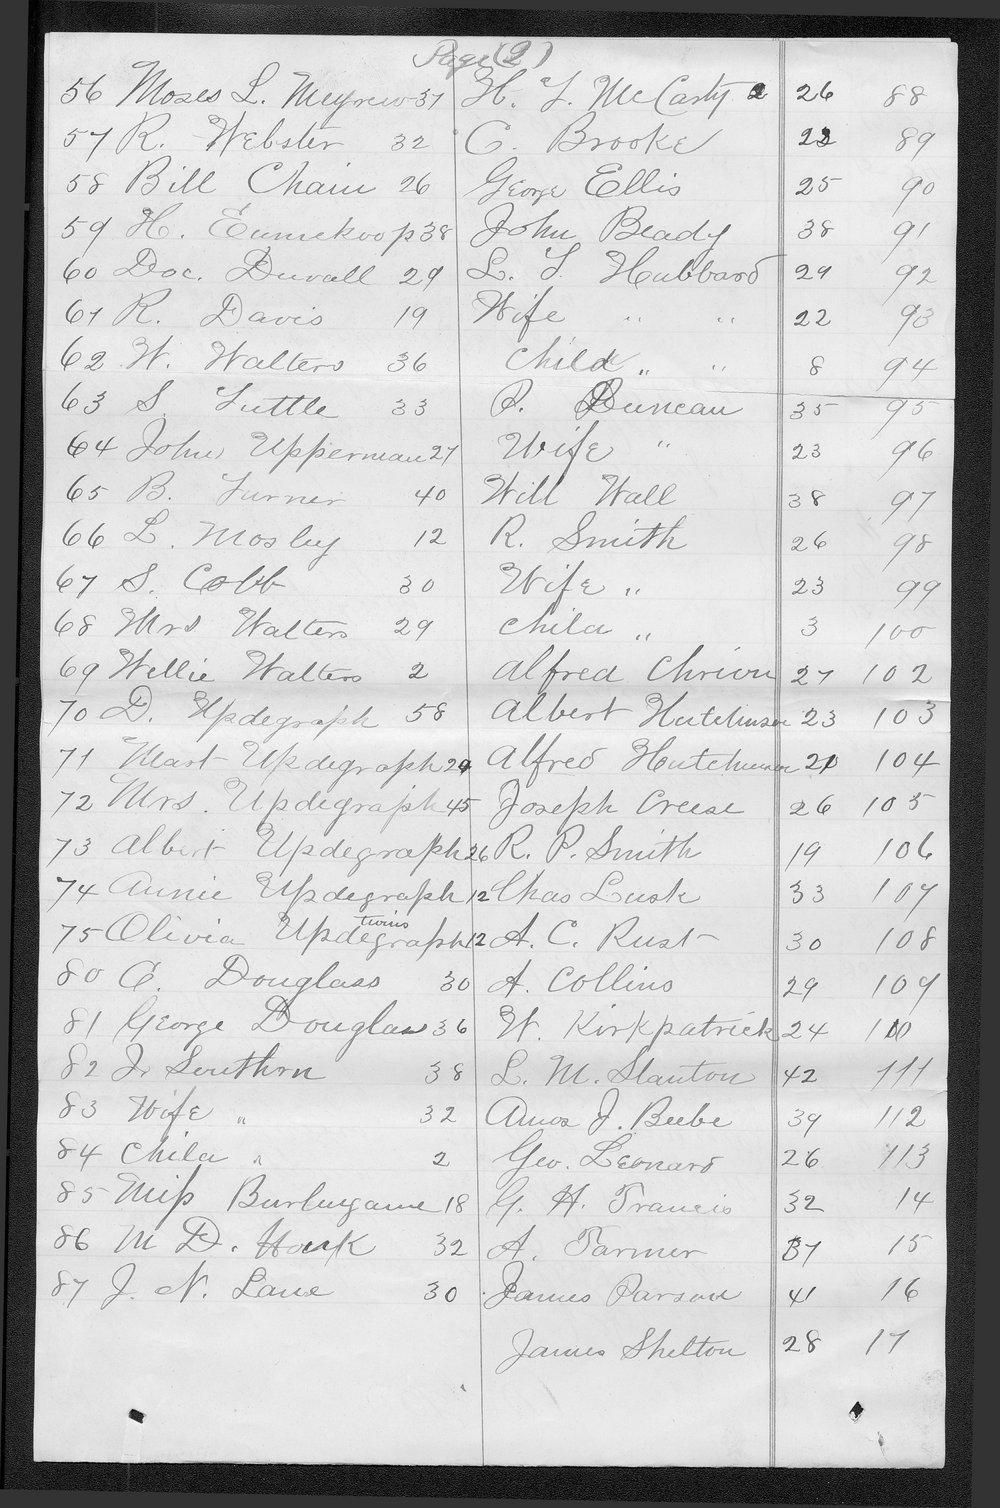 Barber county organization records - 7